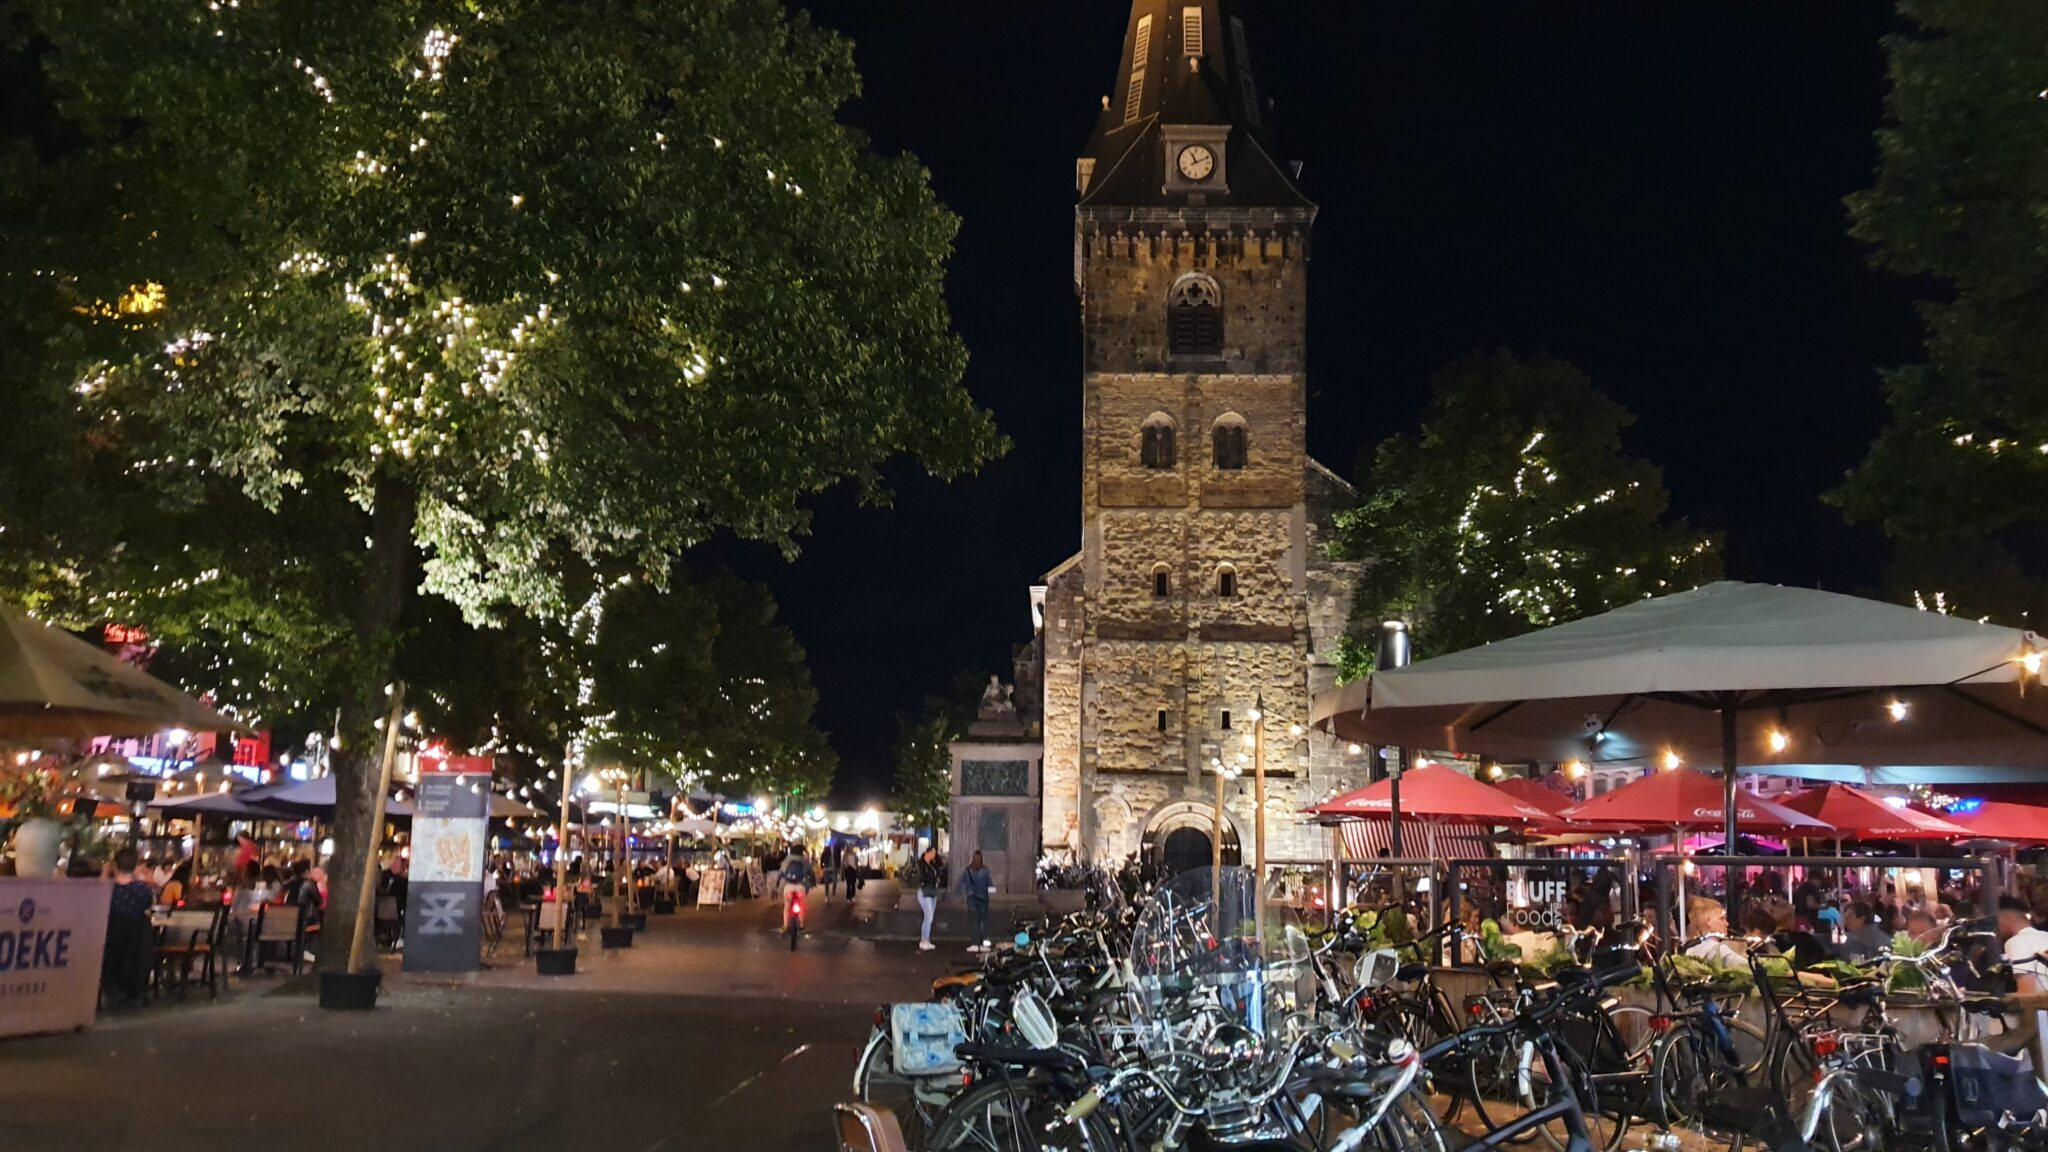 oude markt avond 3